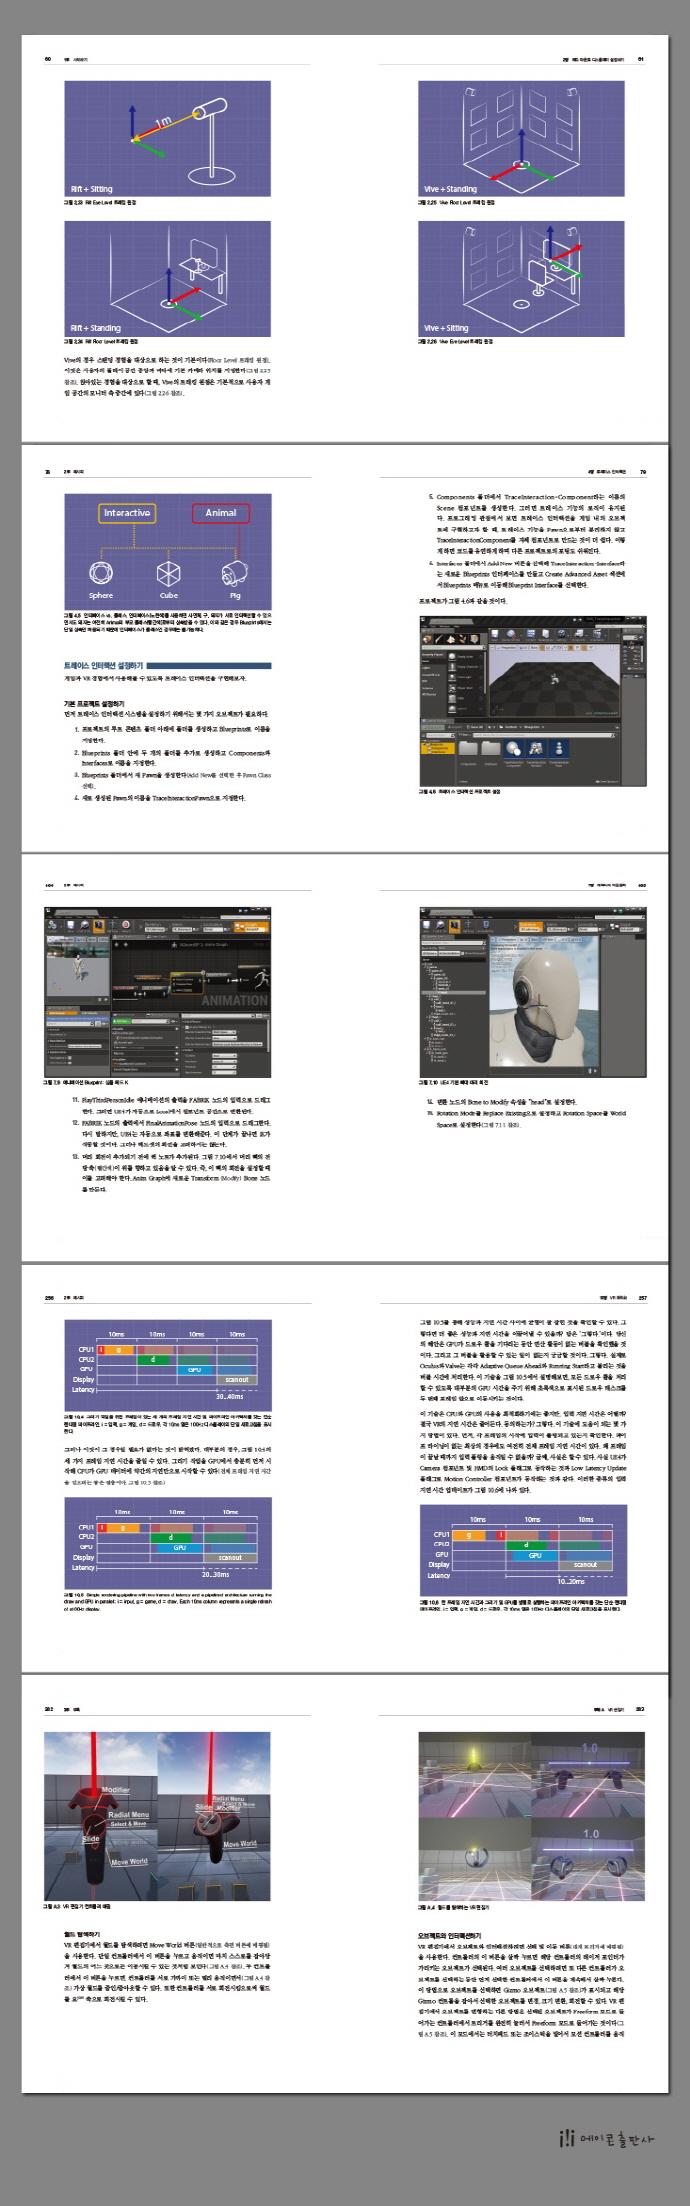 Unreal Engine VR Cookbook(언리얼 엔진 가상 현실 쿡북) 도서 상세이미지